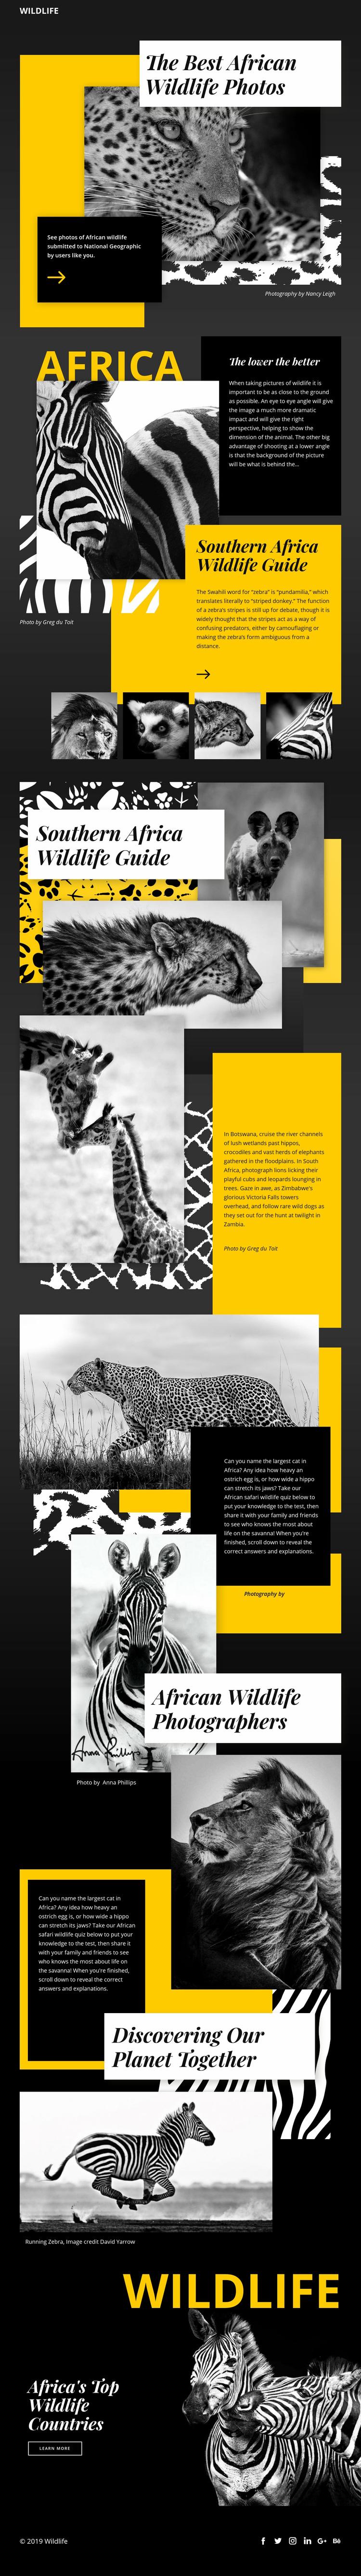 Wildlife Photos Web Page Designer